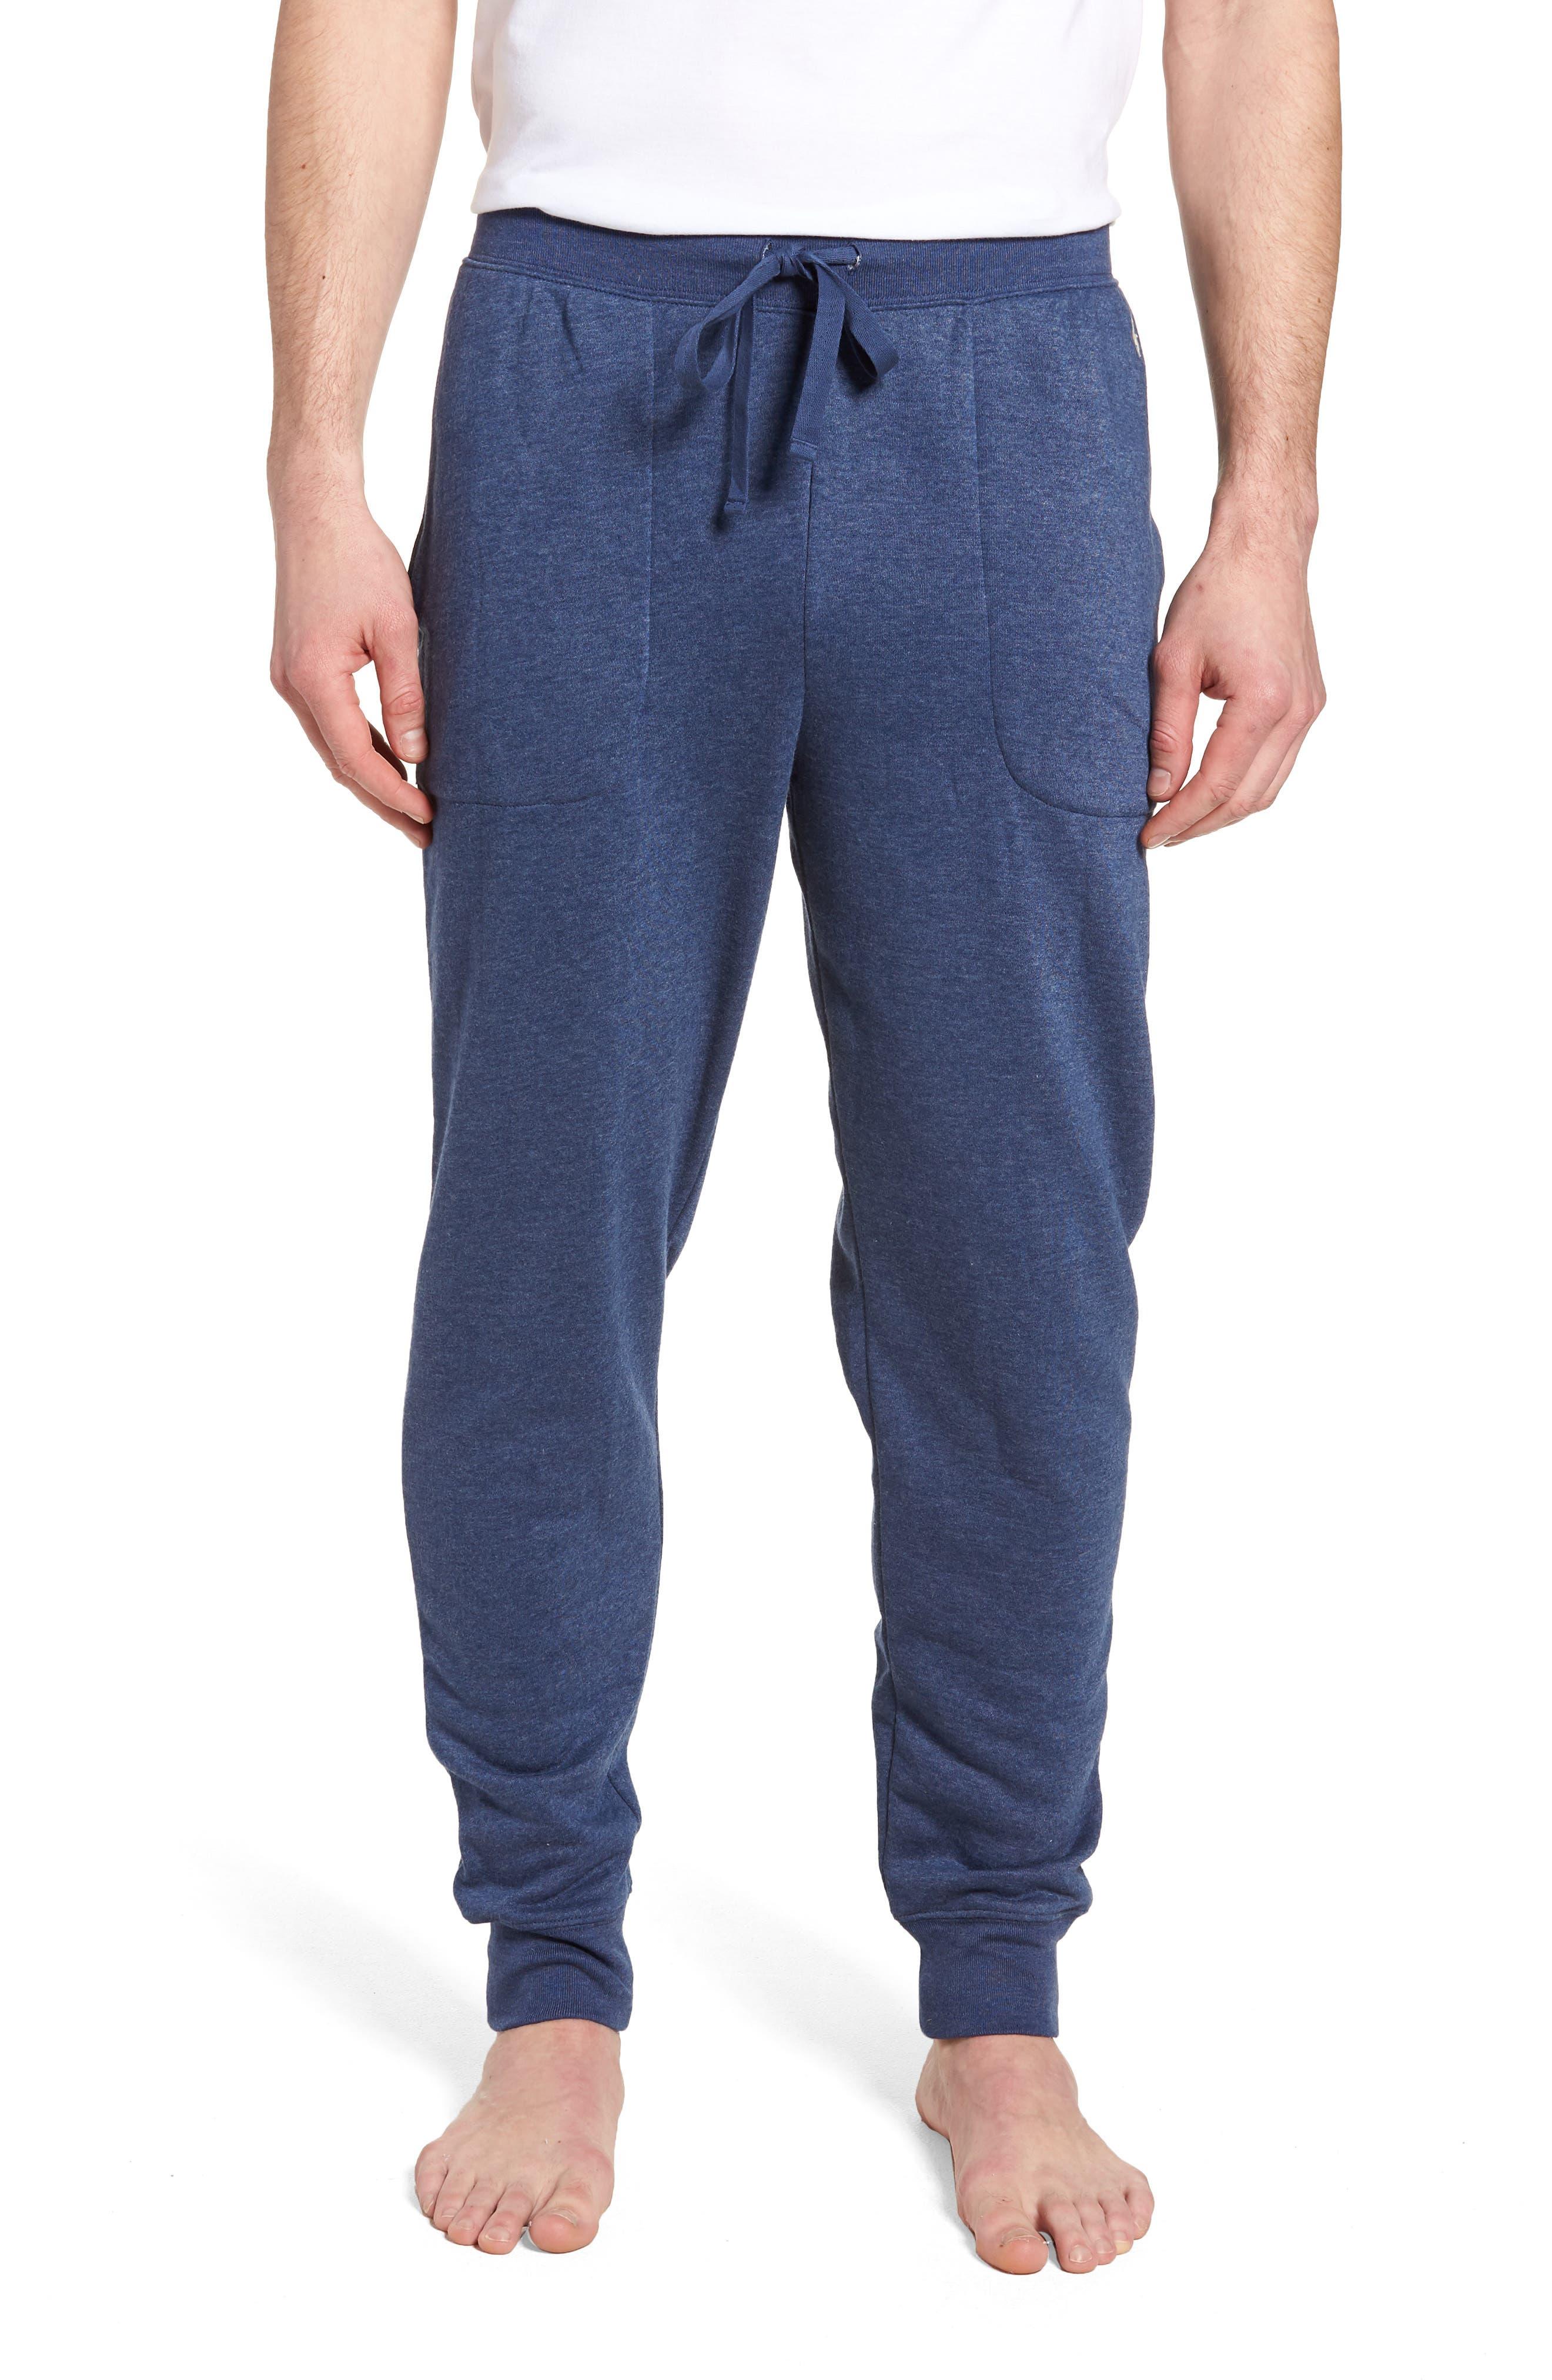 Brushed Jersey Cotton Blend Jogger Pants,                             Main thumbnail 1, color,                             Blue